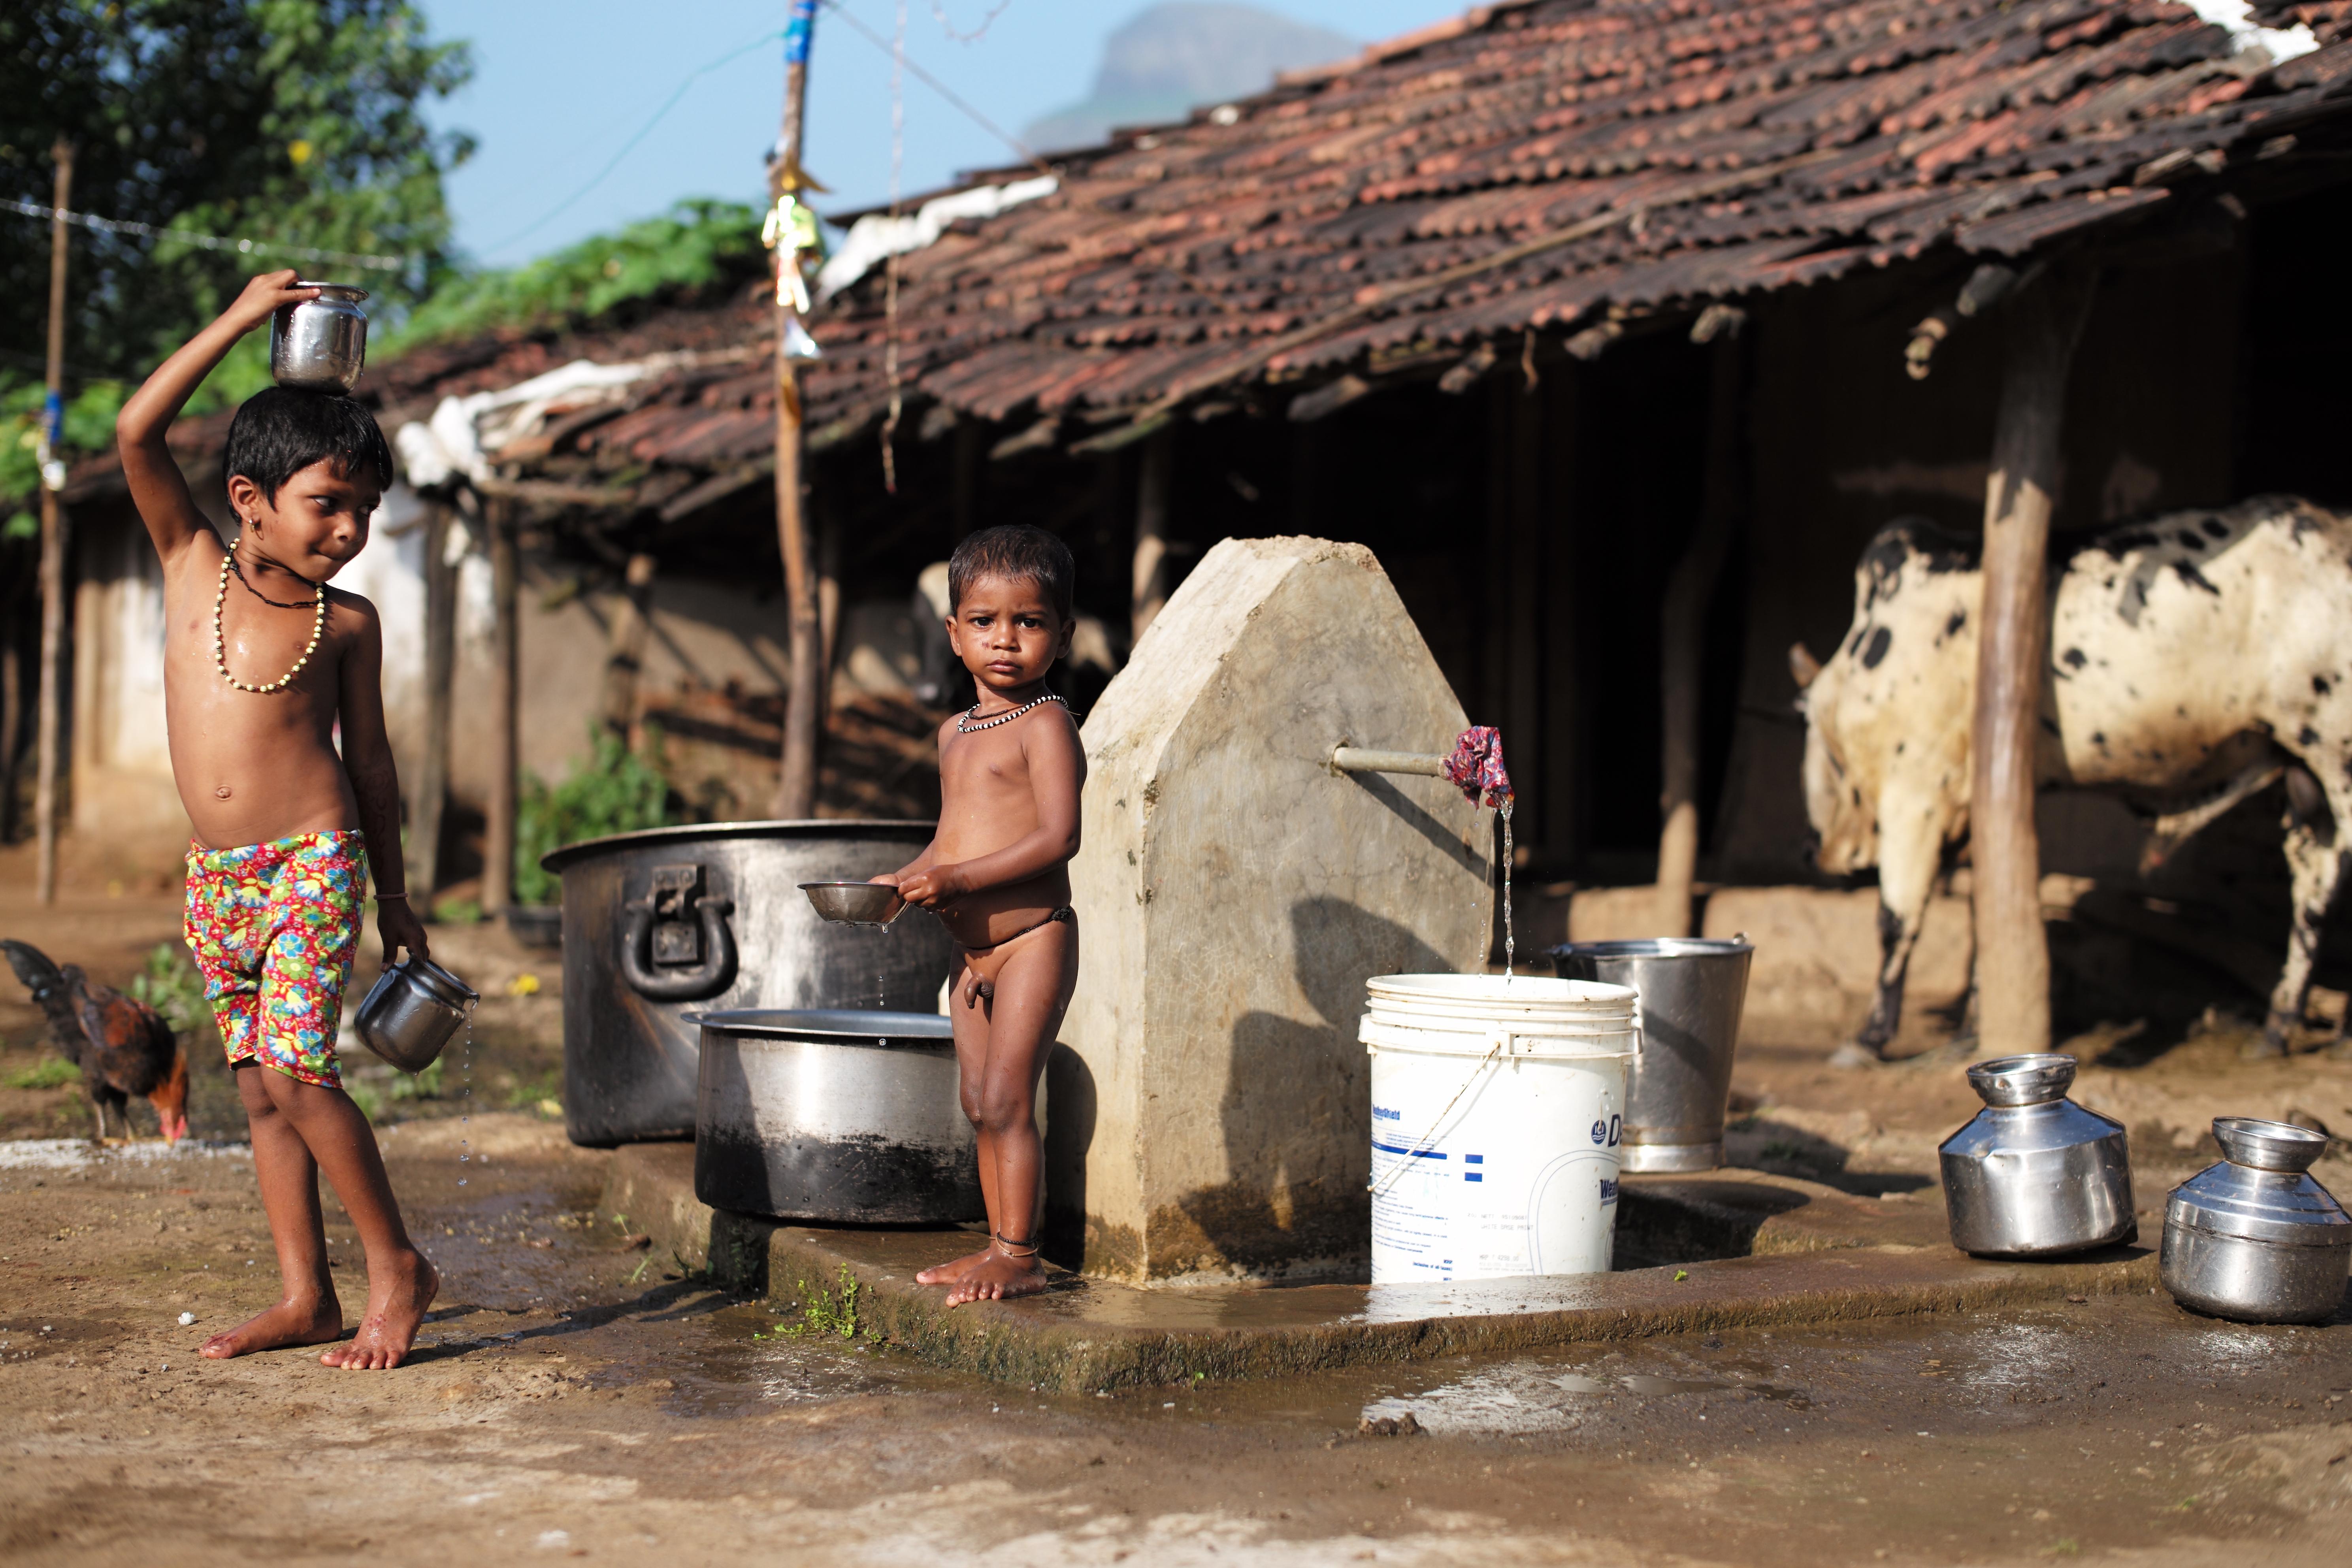 Dorf im indischen Gliedstaat Maharashtra